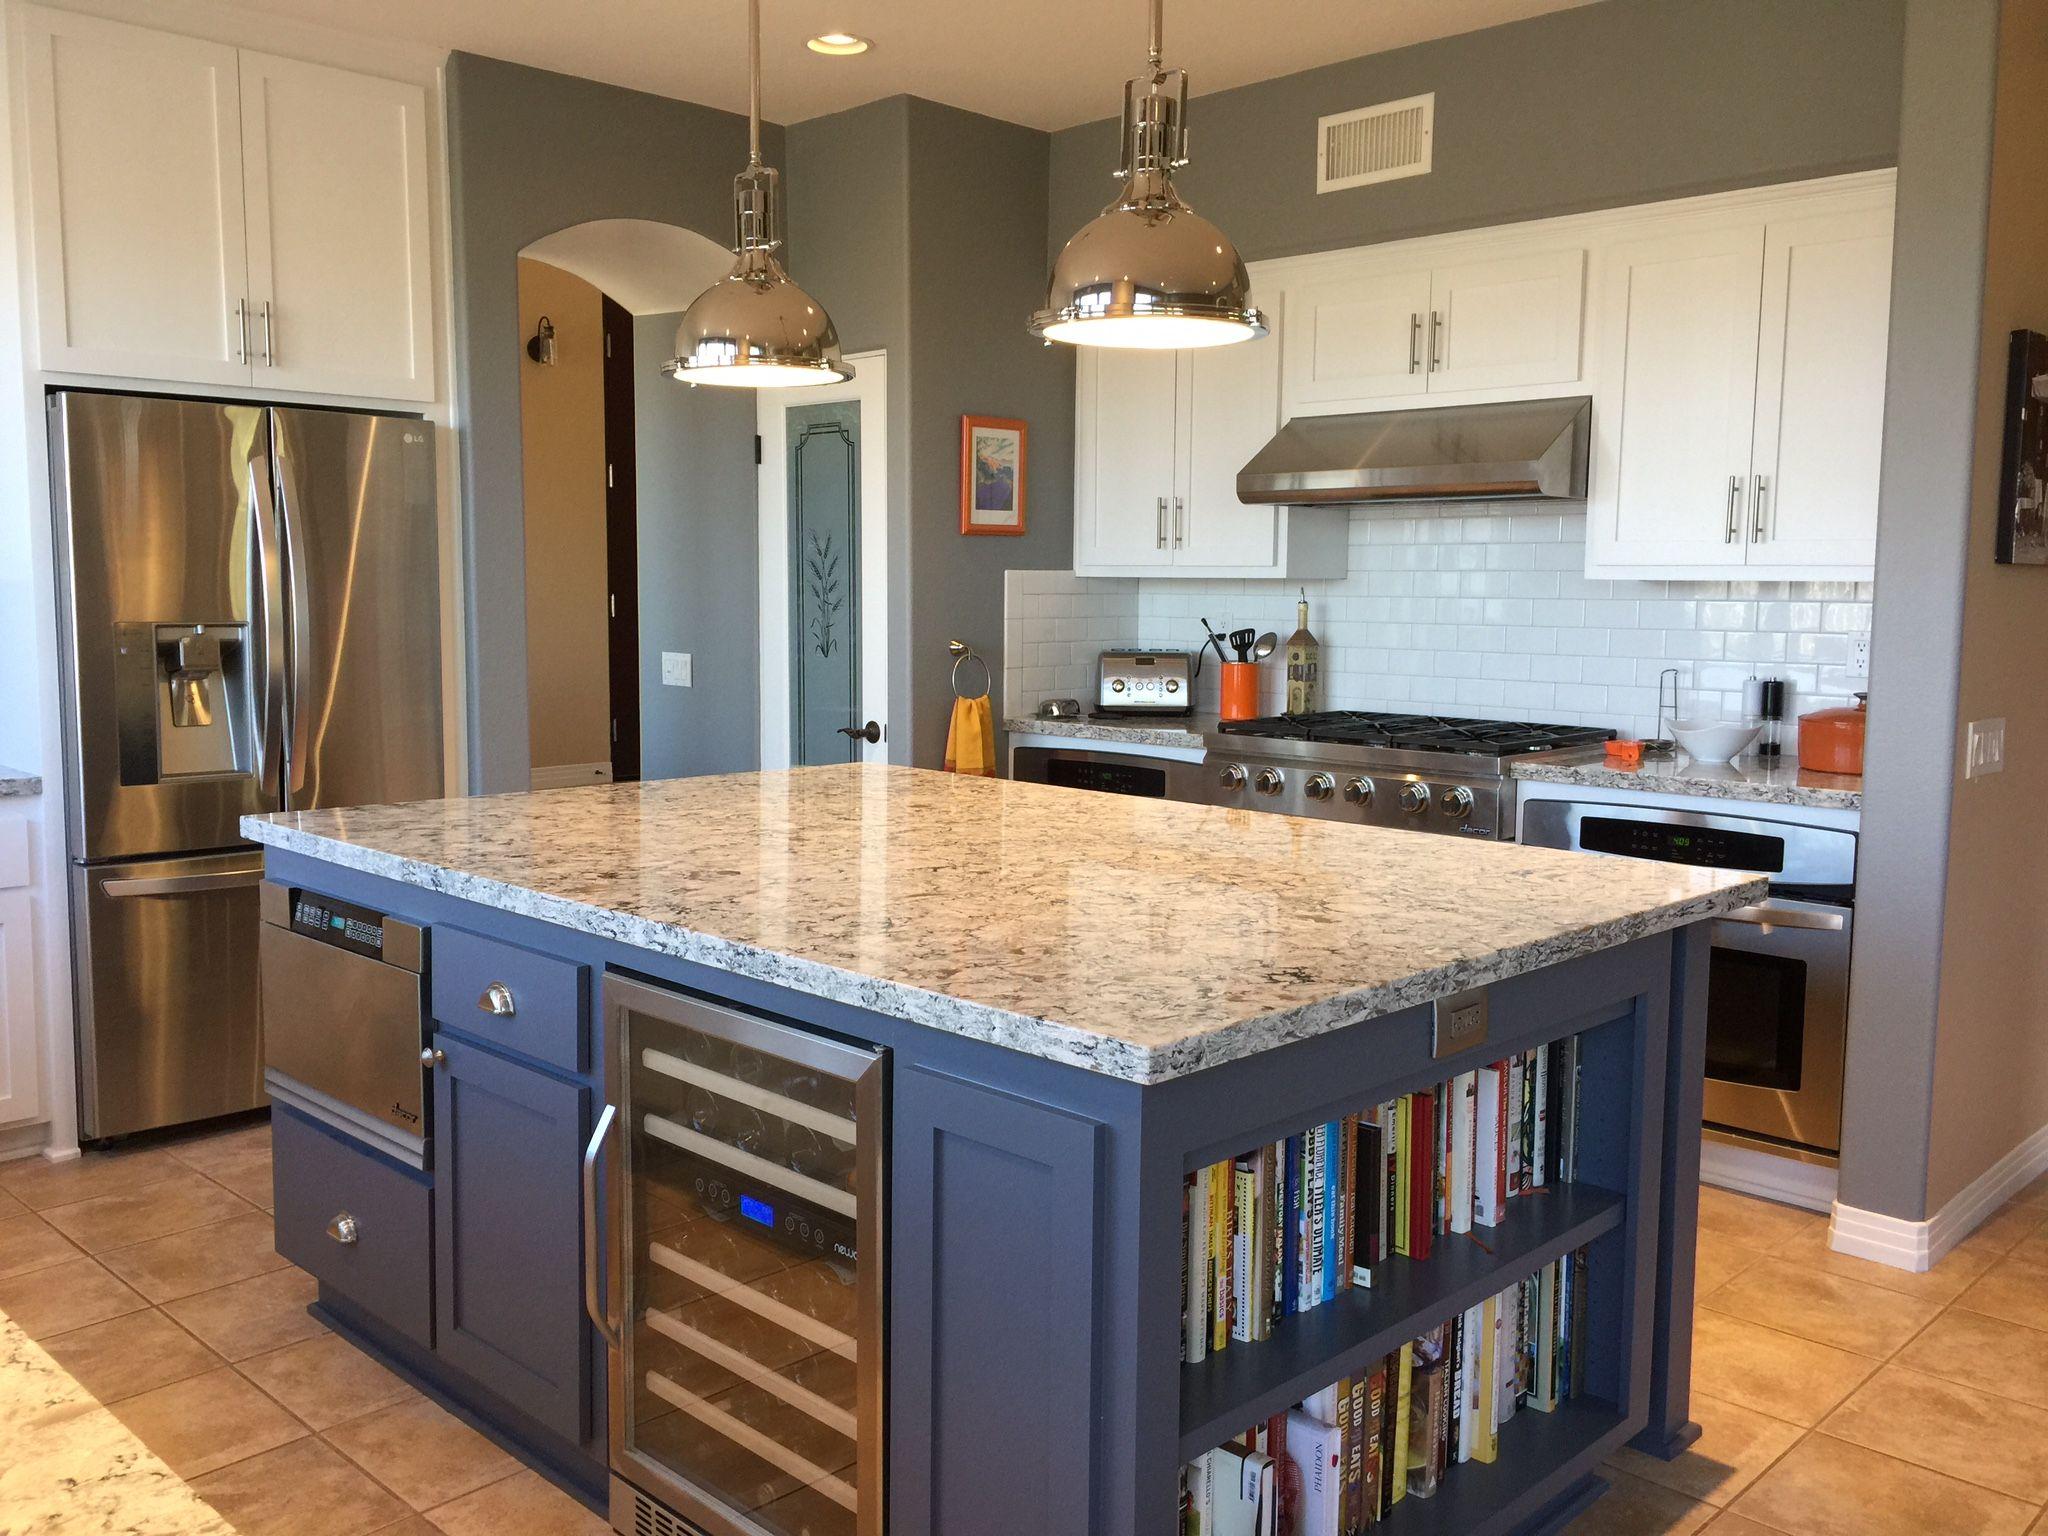 Final kitchen cambria praa sands quartz countertop restoration